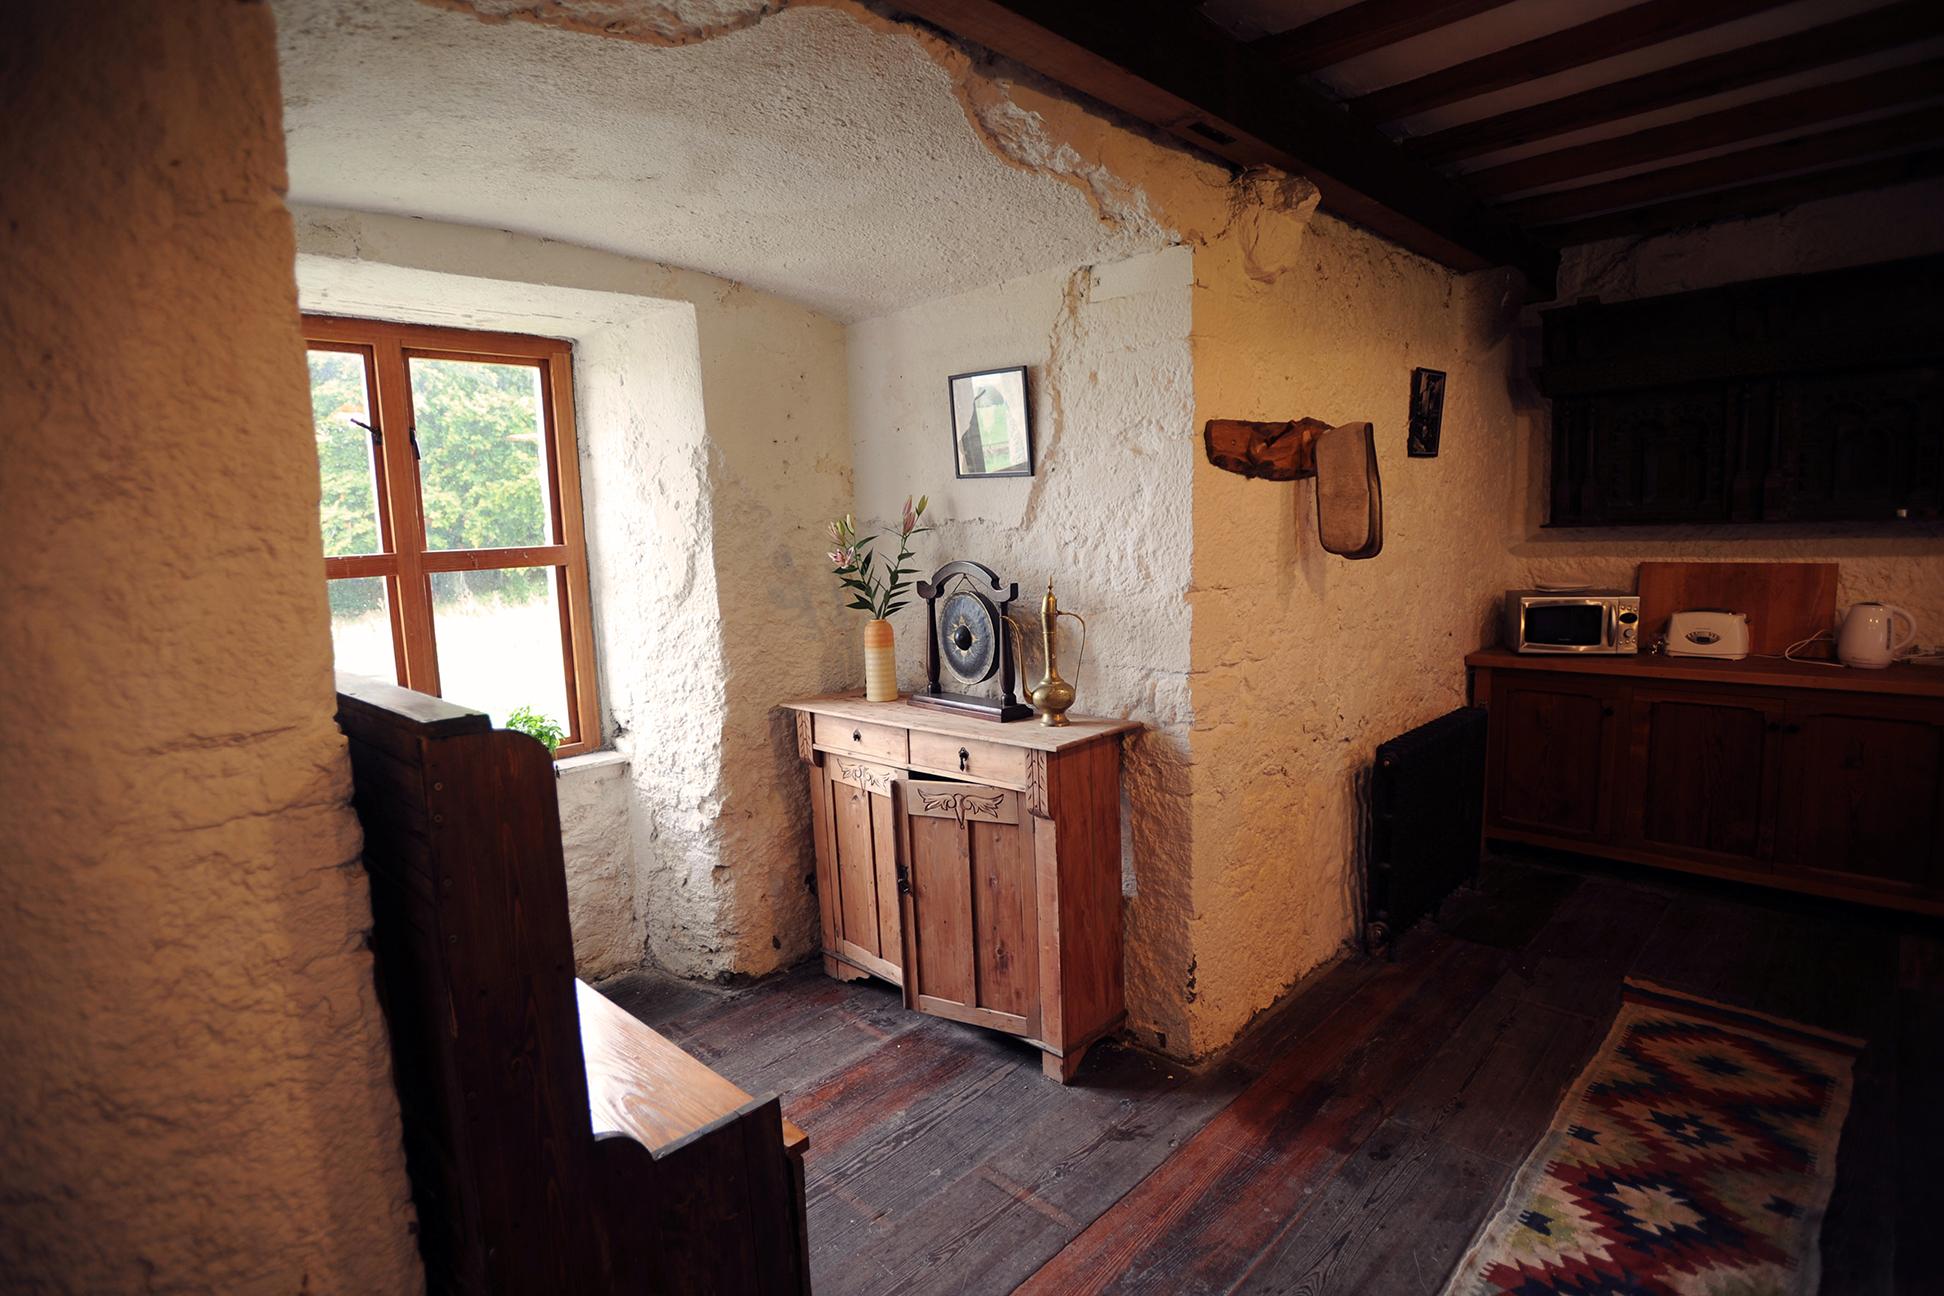 windowlivingroom.jpg